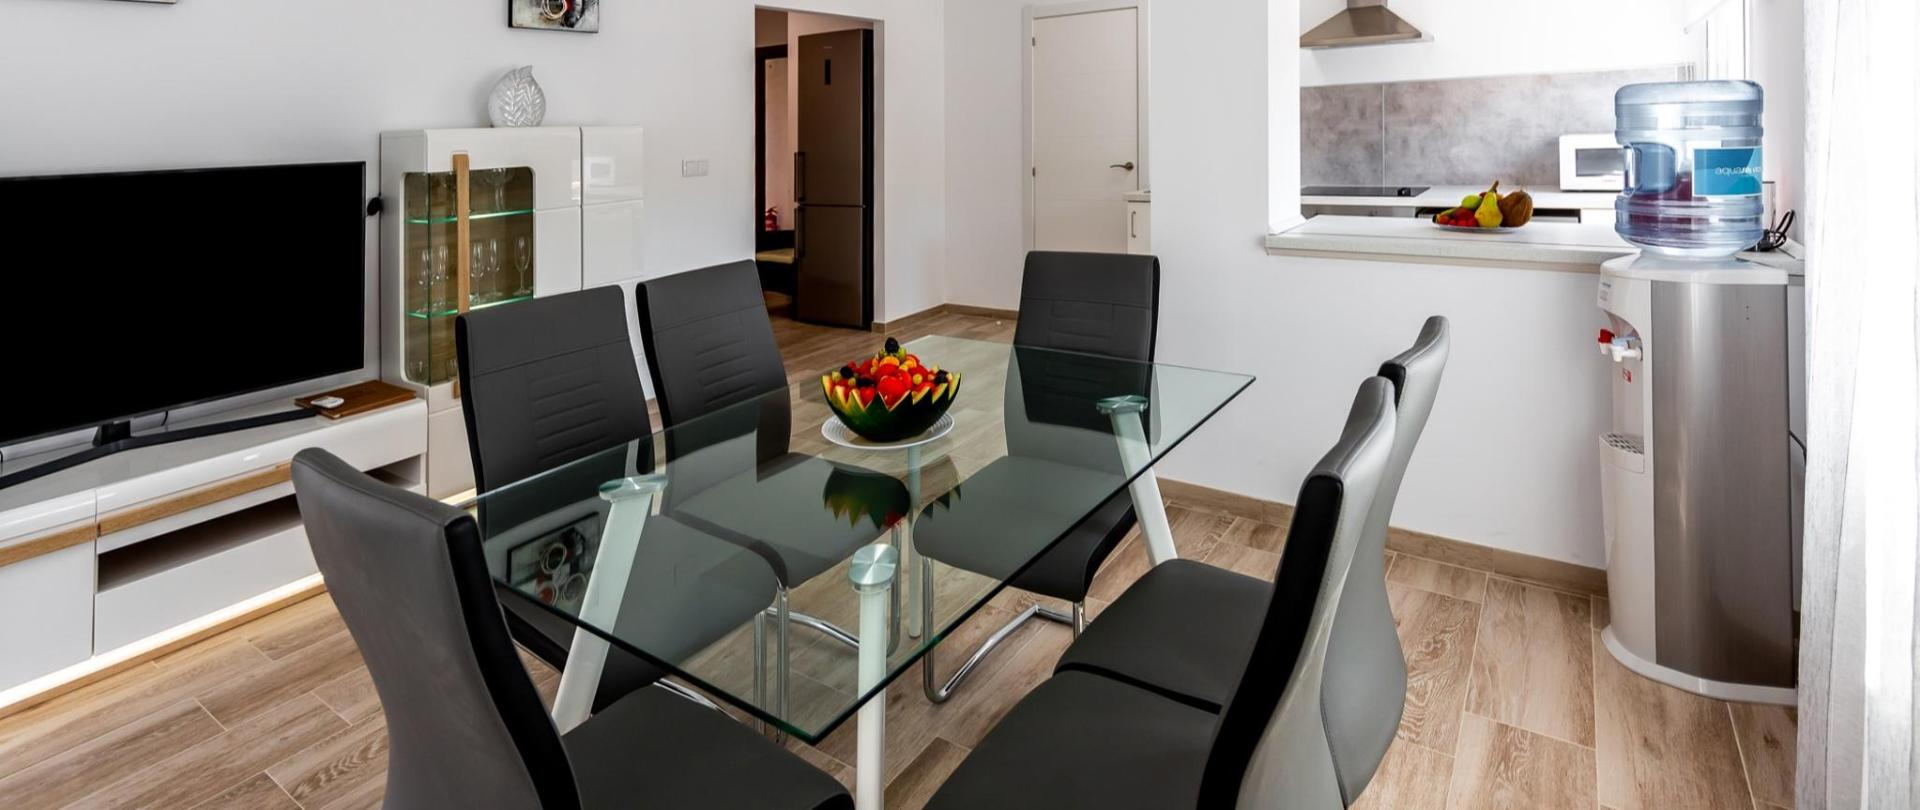 Sonrisa Apartments - Penthouse10.jpg